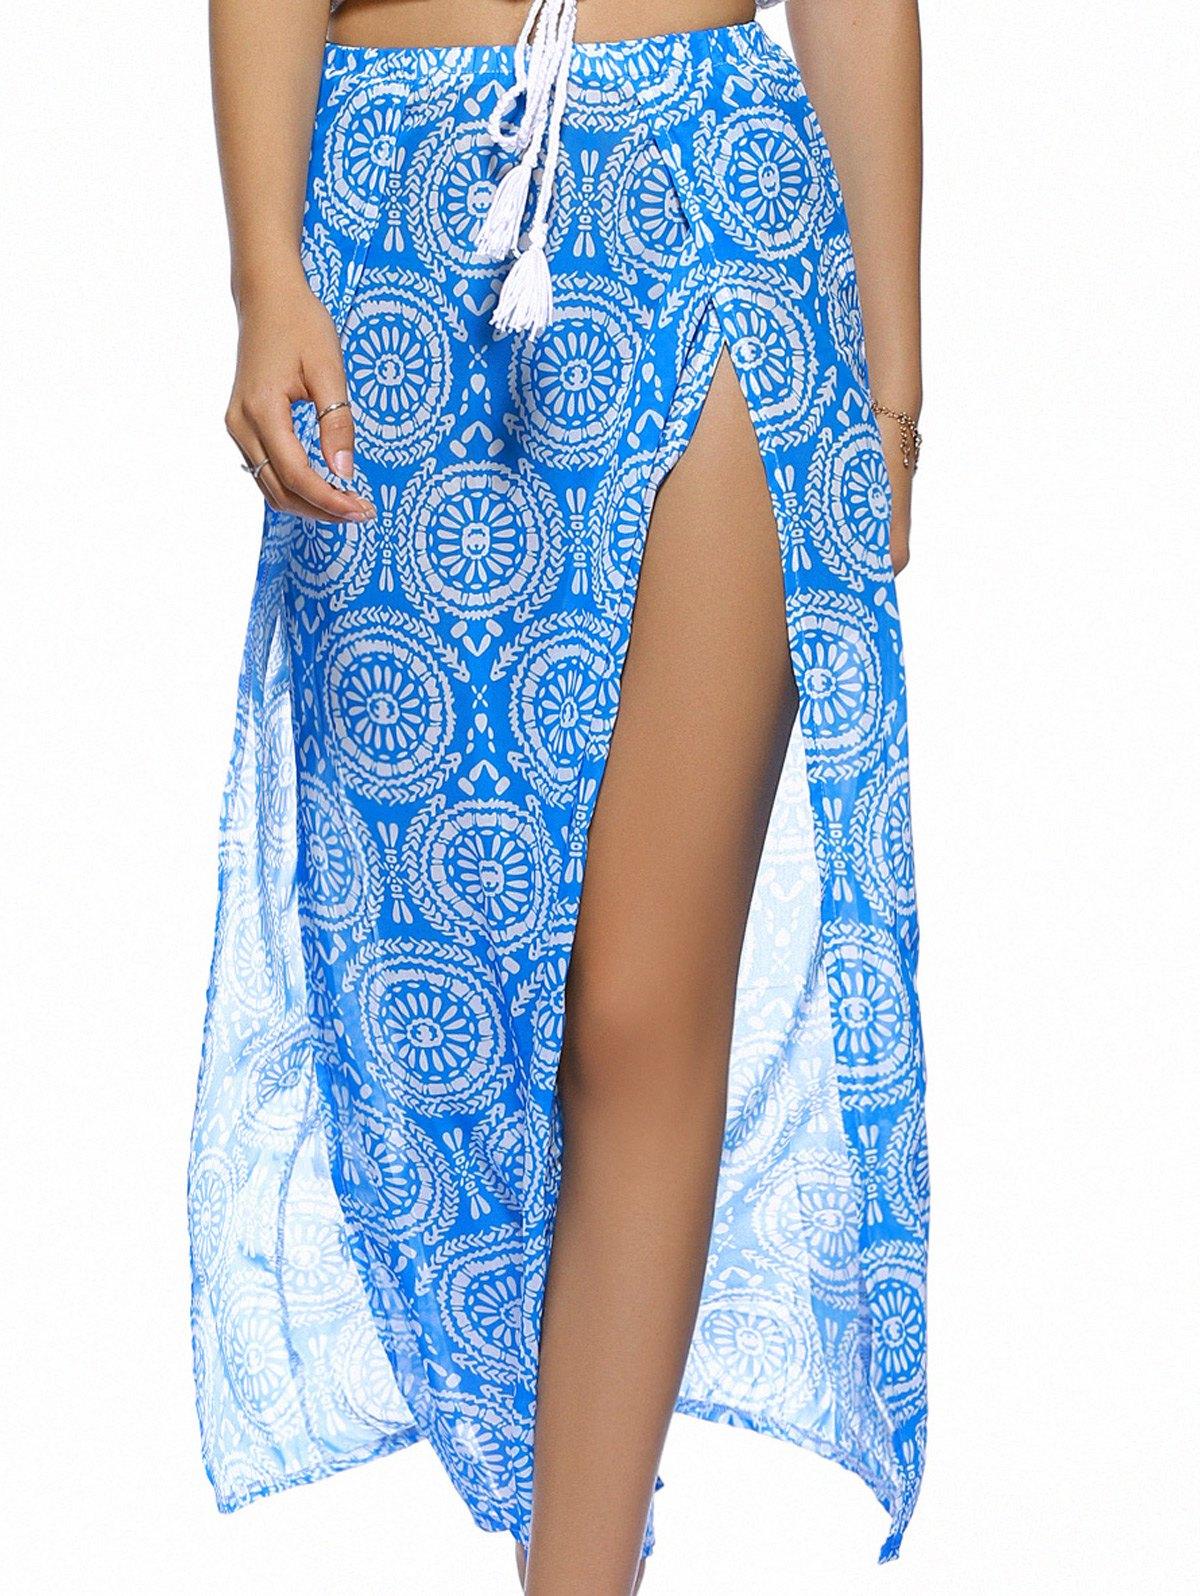 Double Slit Round Print Long Skirt